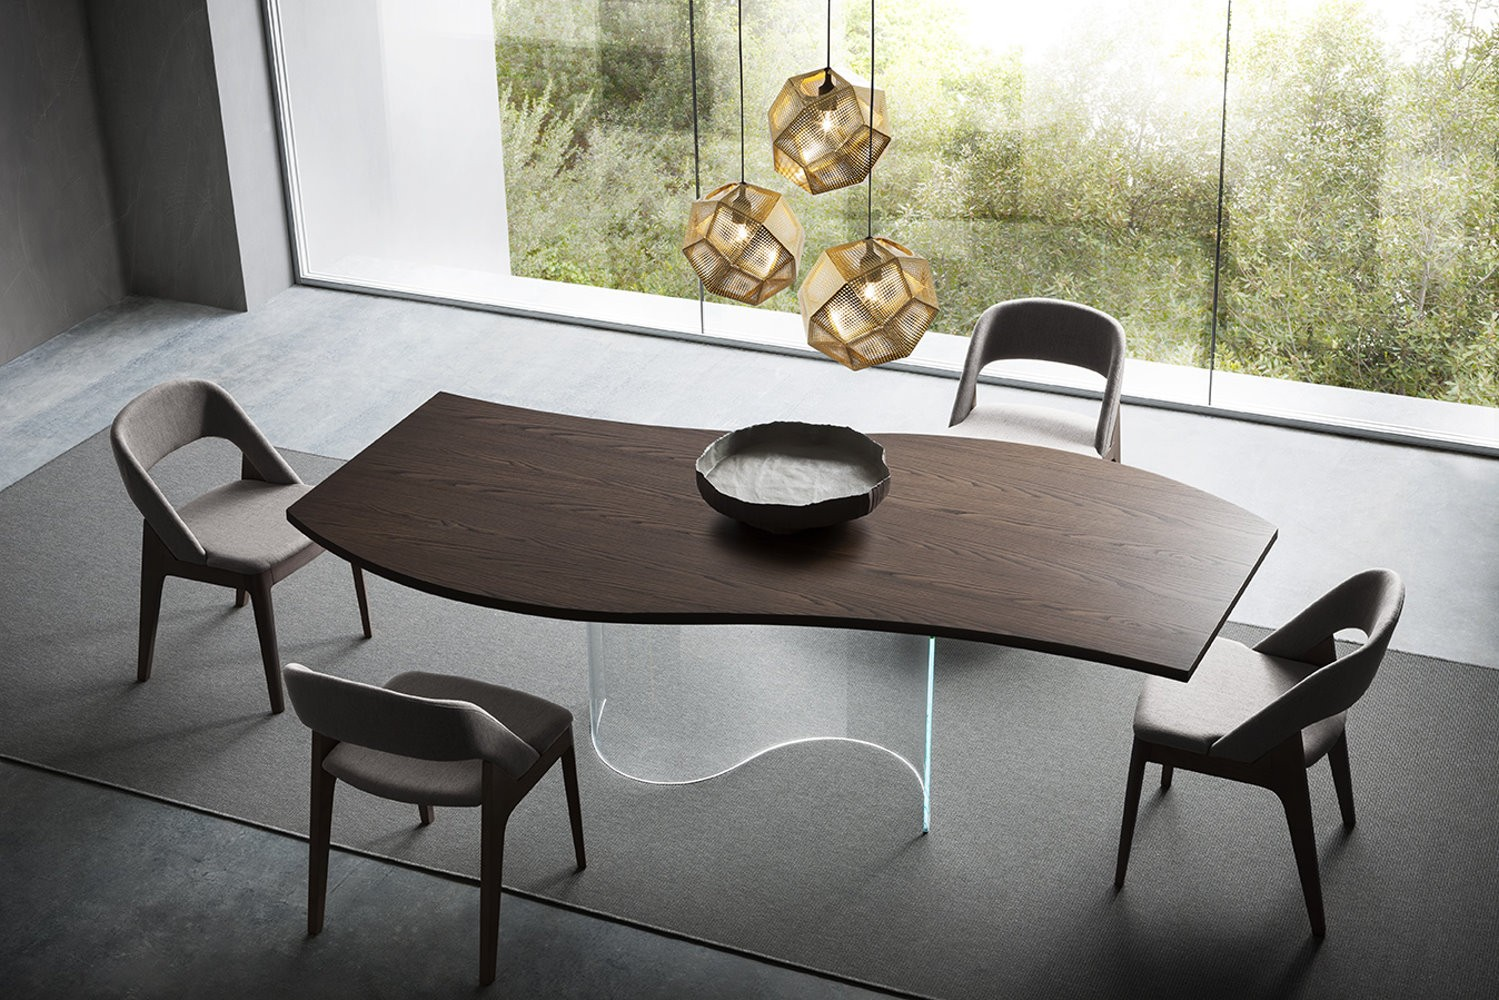 Tavoli e Sedie : Tavoli e Sedie